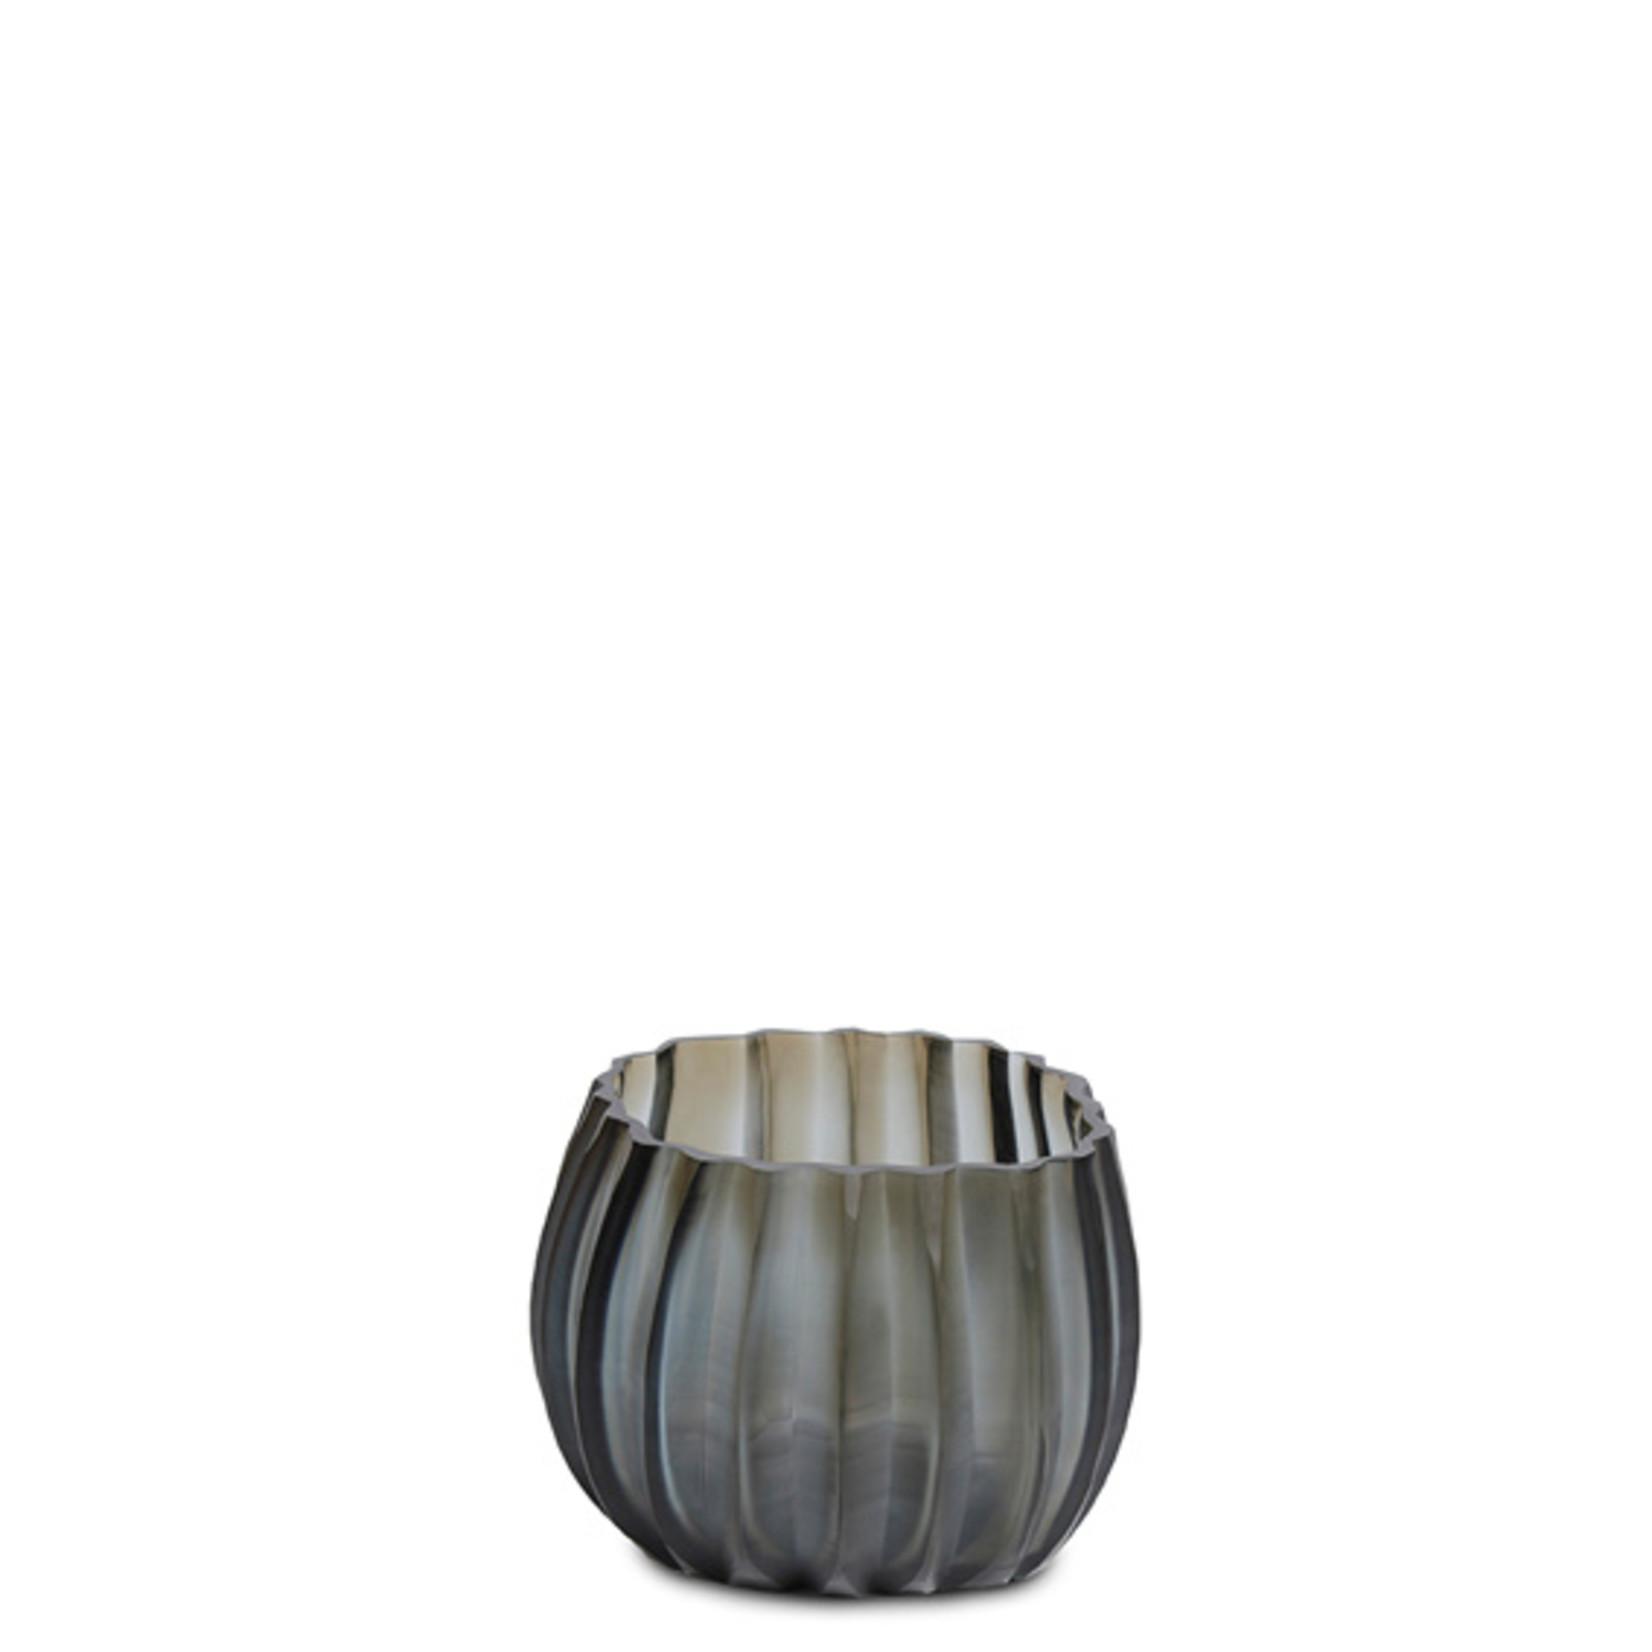 Guaxs Tea light holder Manakara   Indigo / Smoke Gray